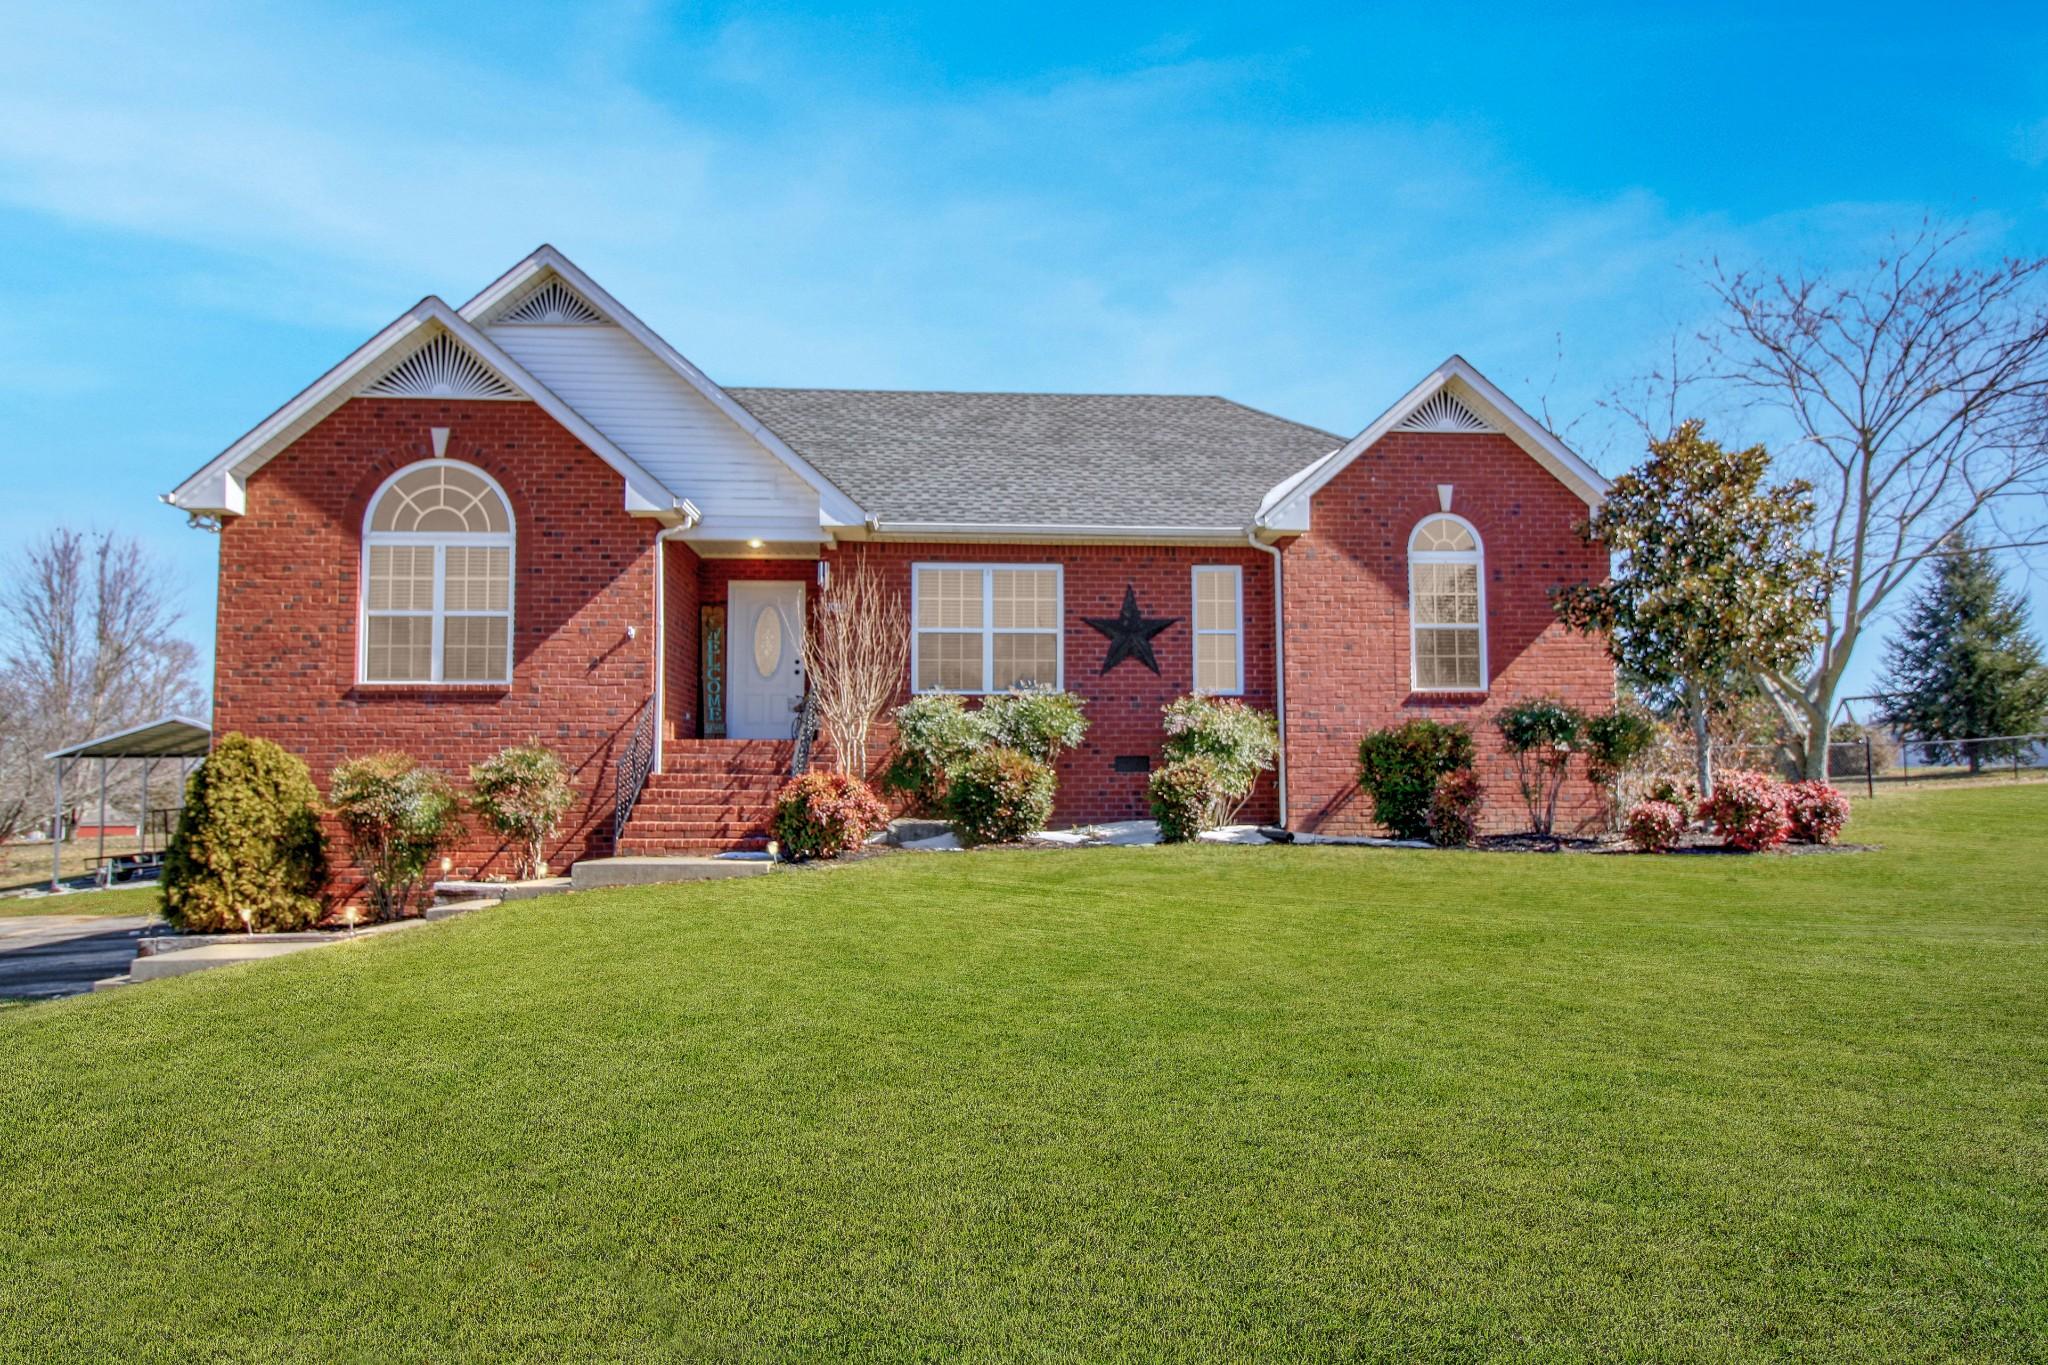 1002 Deann Ct Property Photo - Cottontown, TN real estate listing